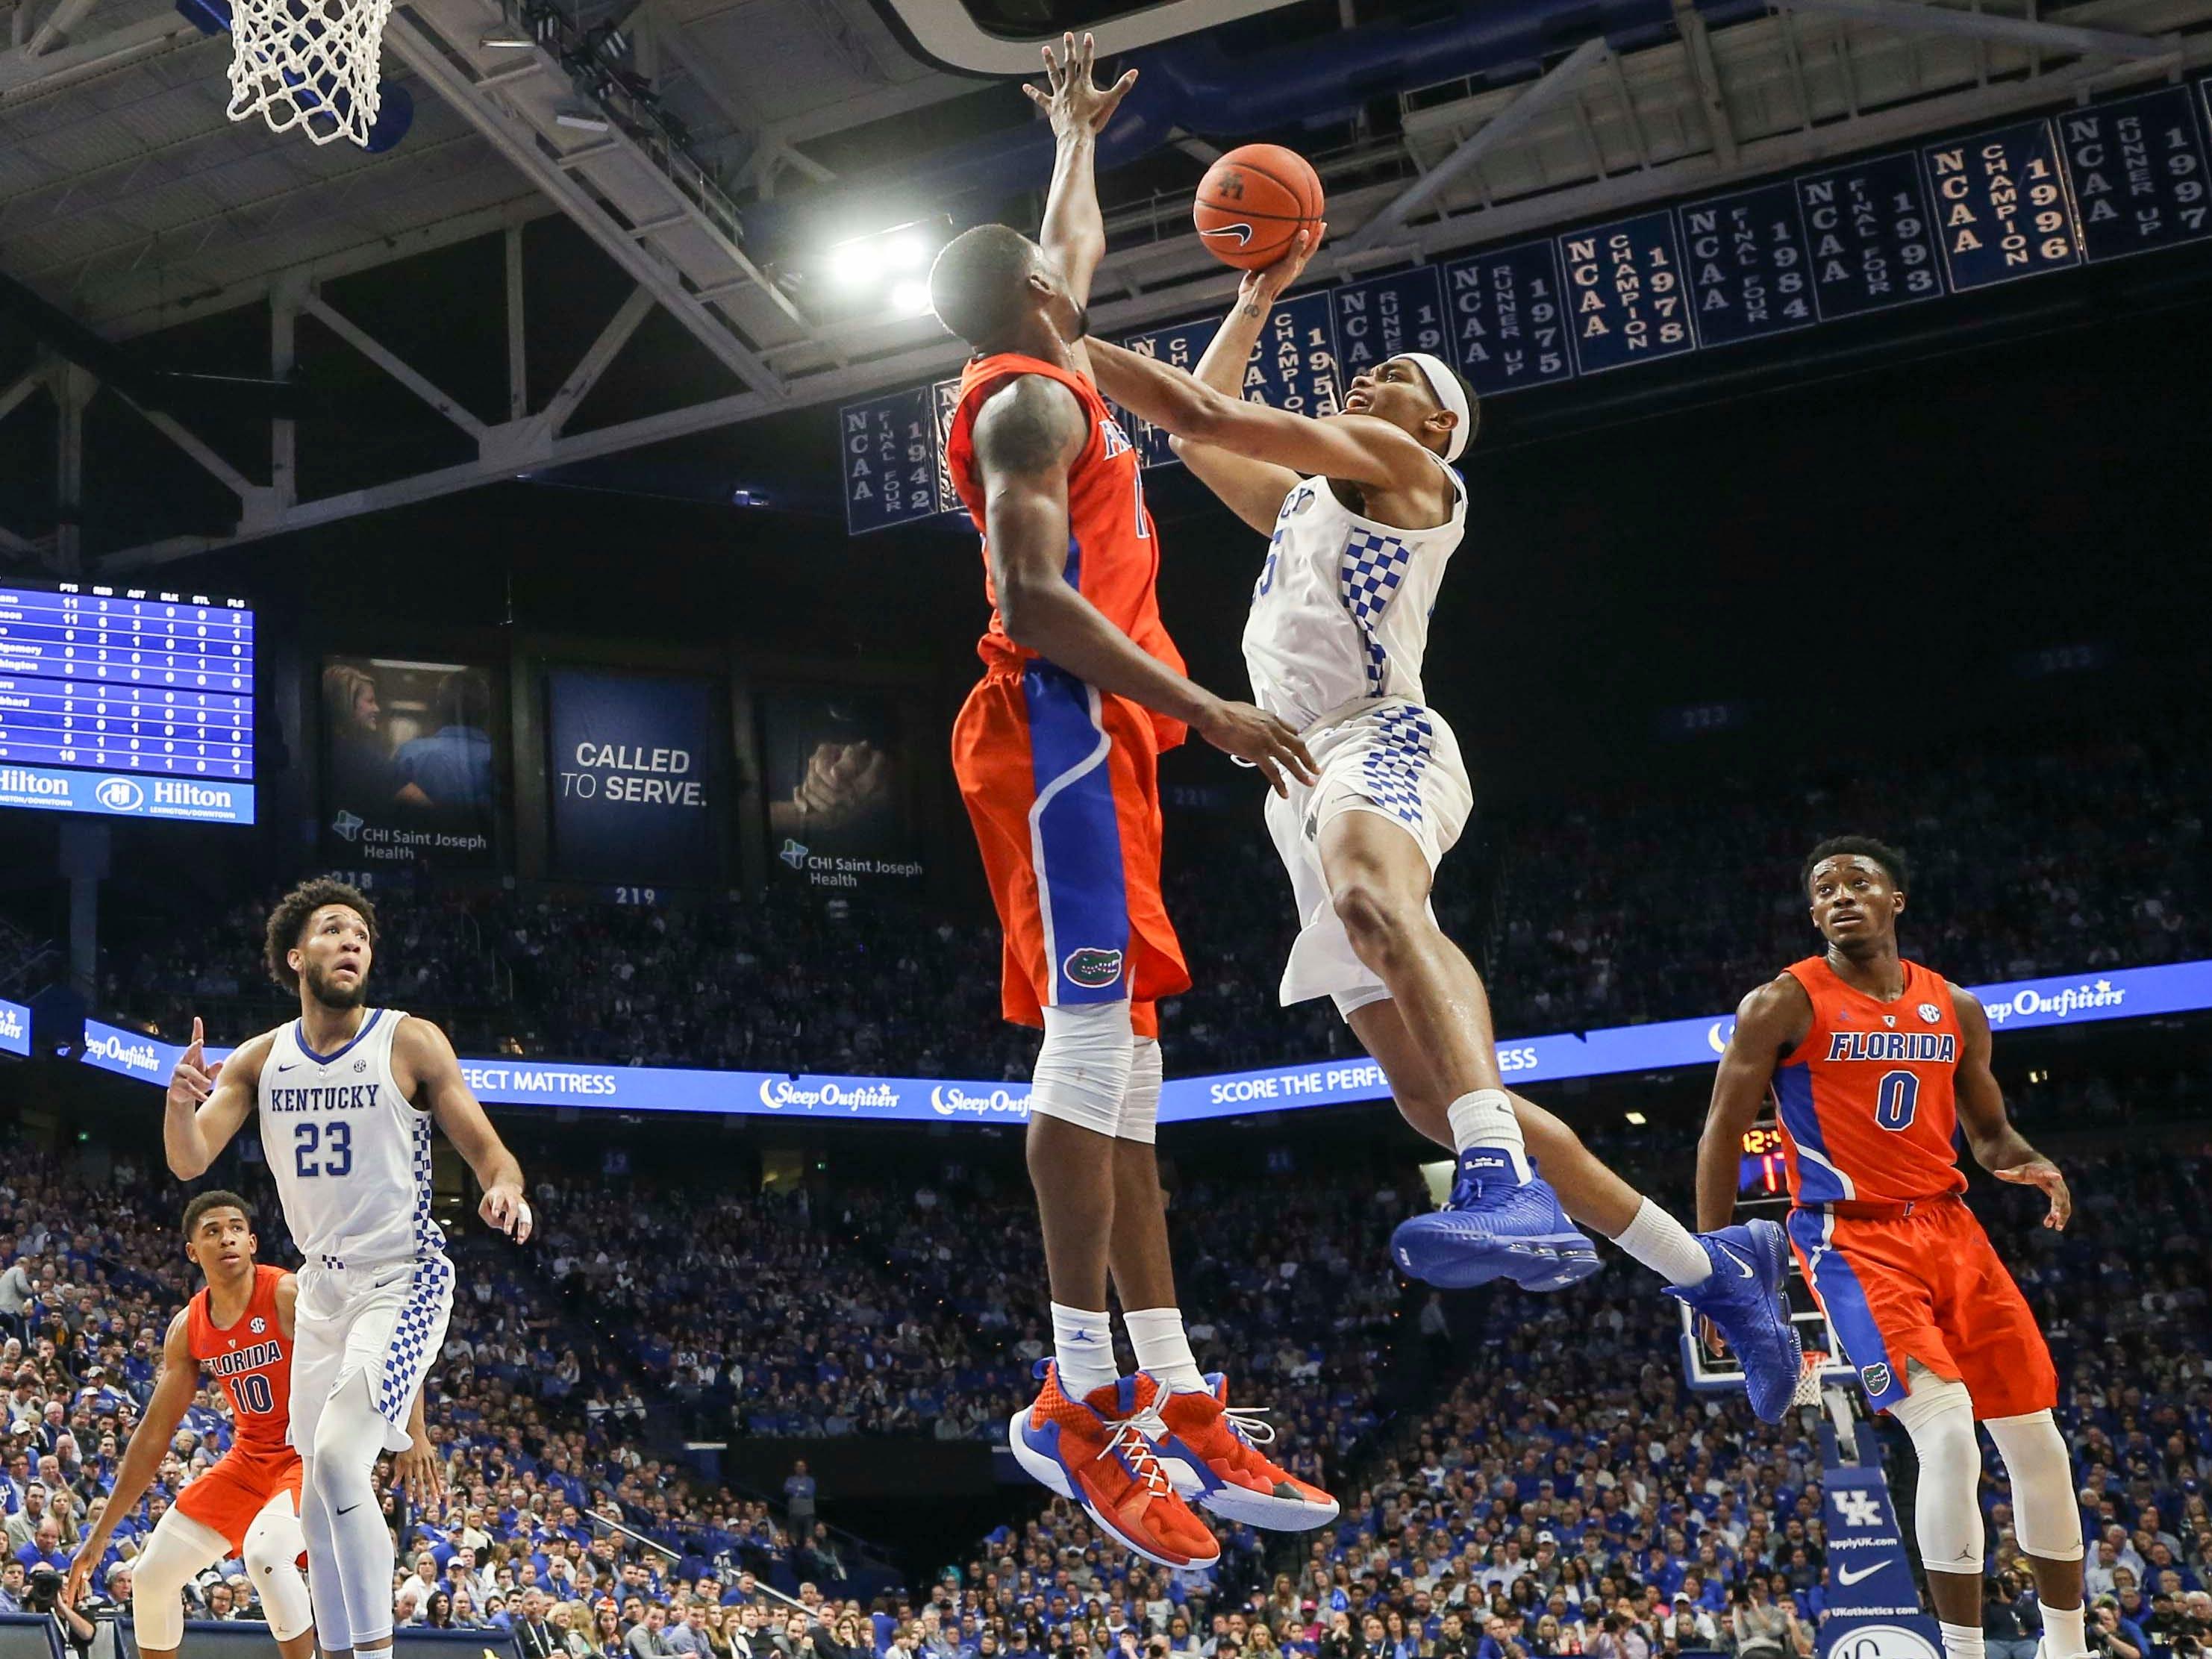 Kentucky's PJ Washington JR scored this shot against Florida. Wildcats won, 66-57.  March 9, 2019